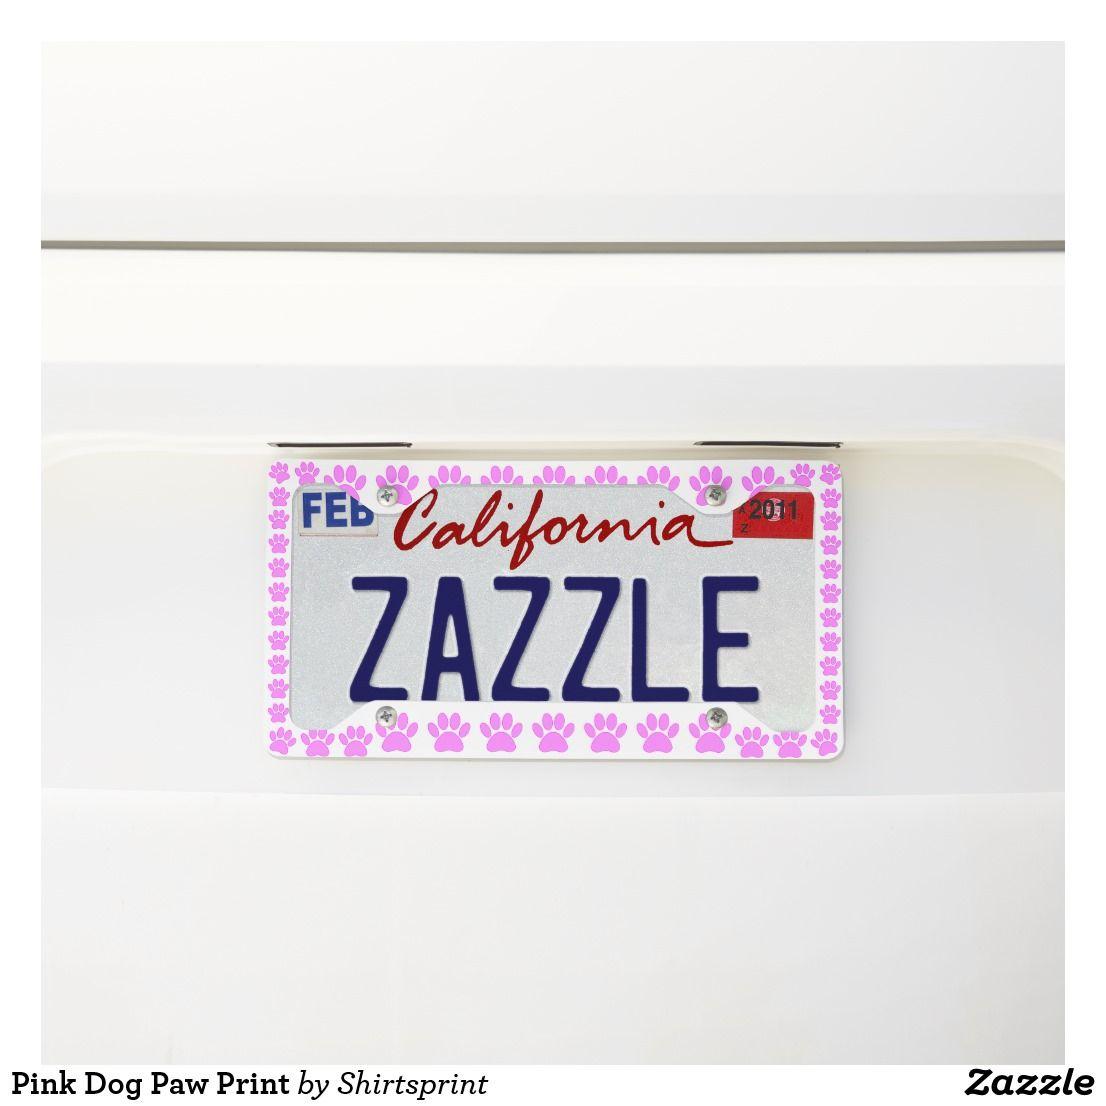 Pink Dog Paw Print License Plate Frame